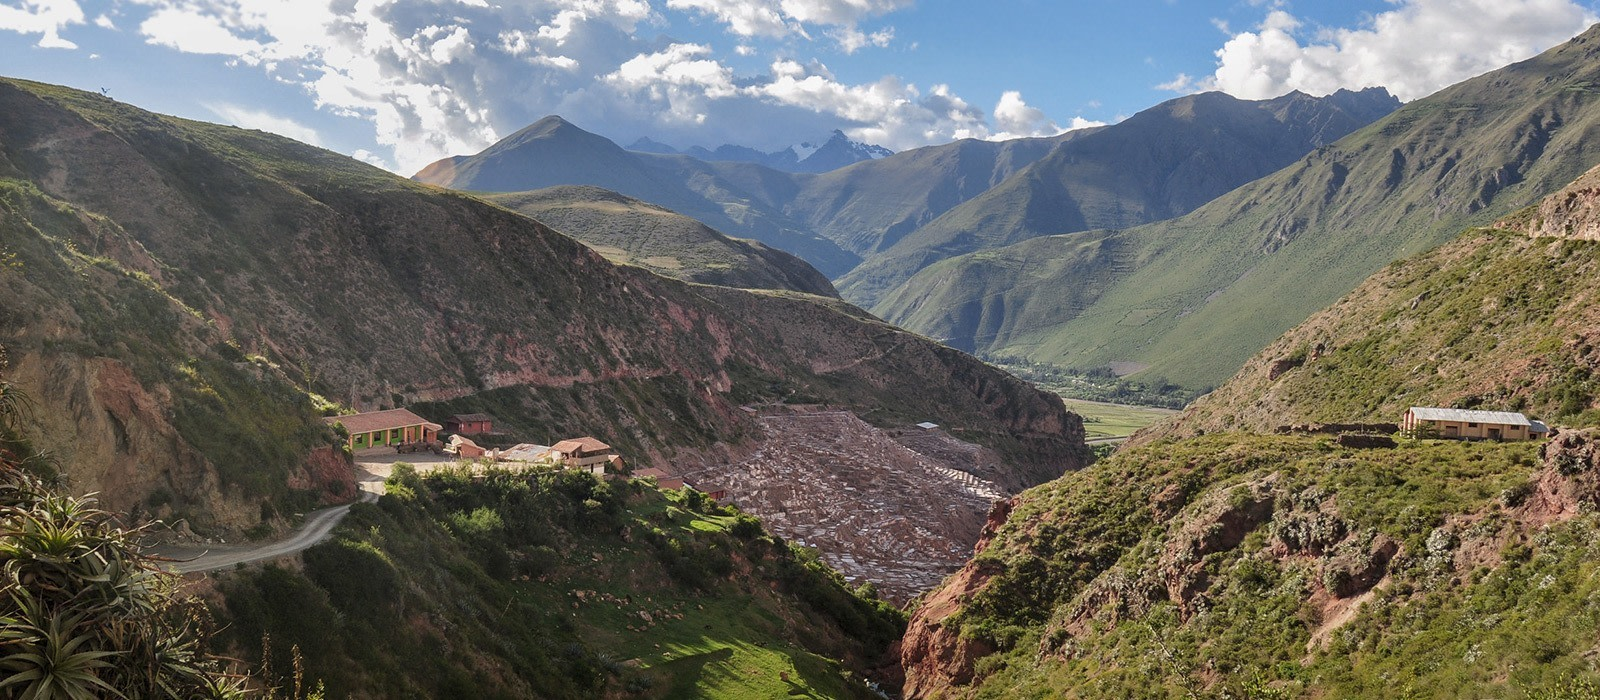 Peru & Galapagos: Natural Marvels Tour Trip 1